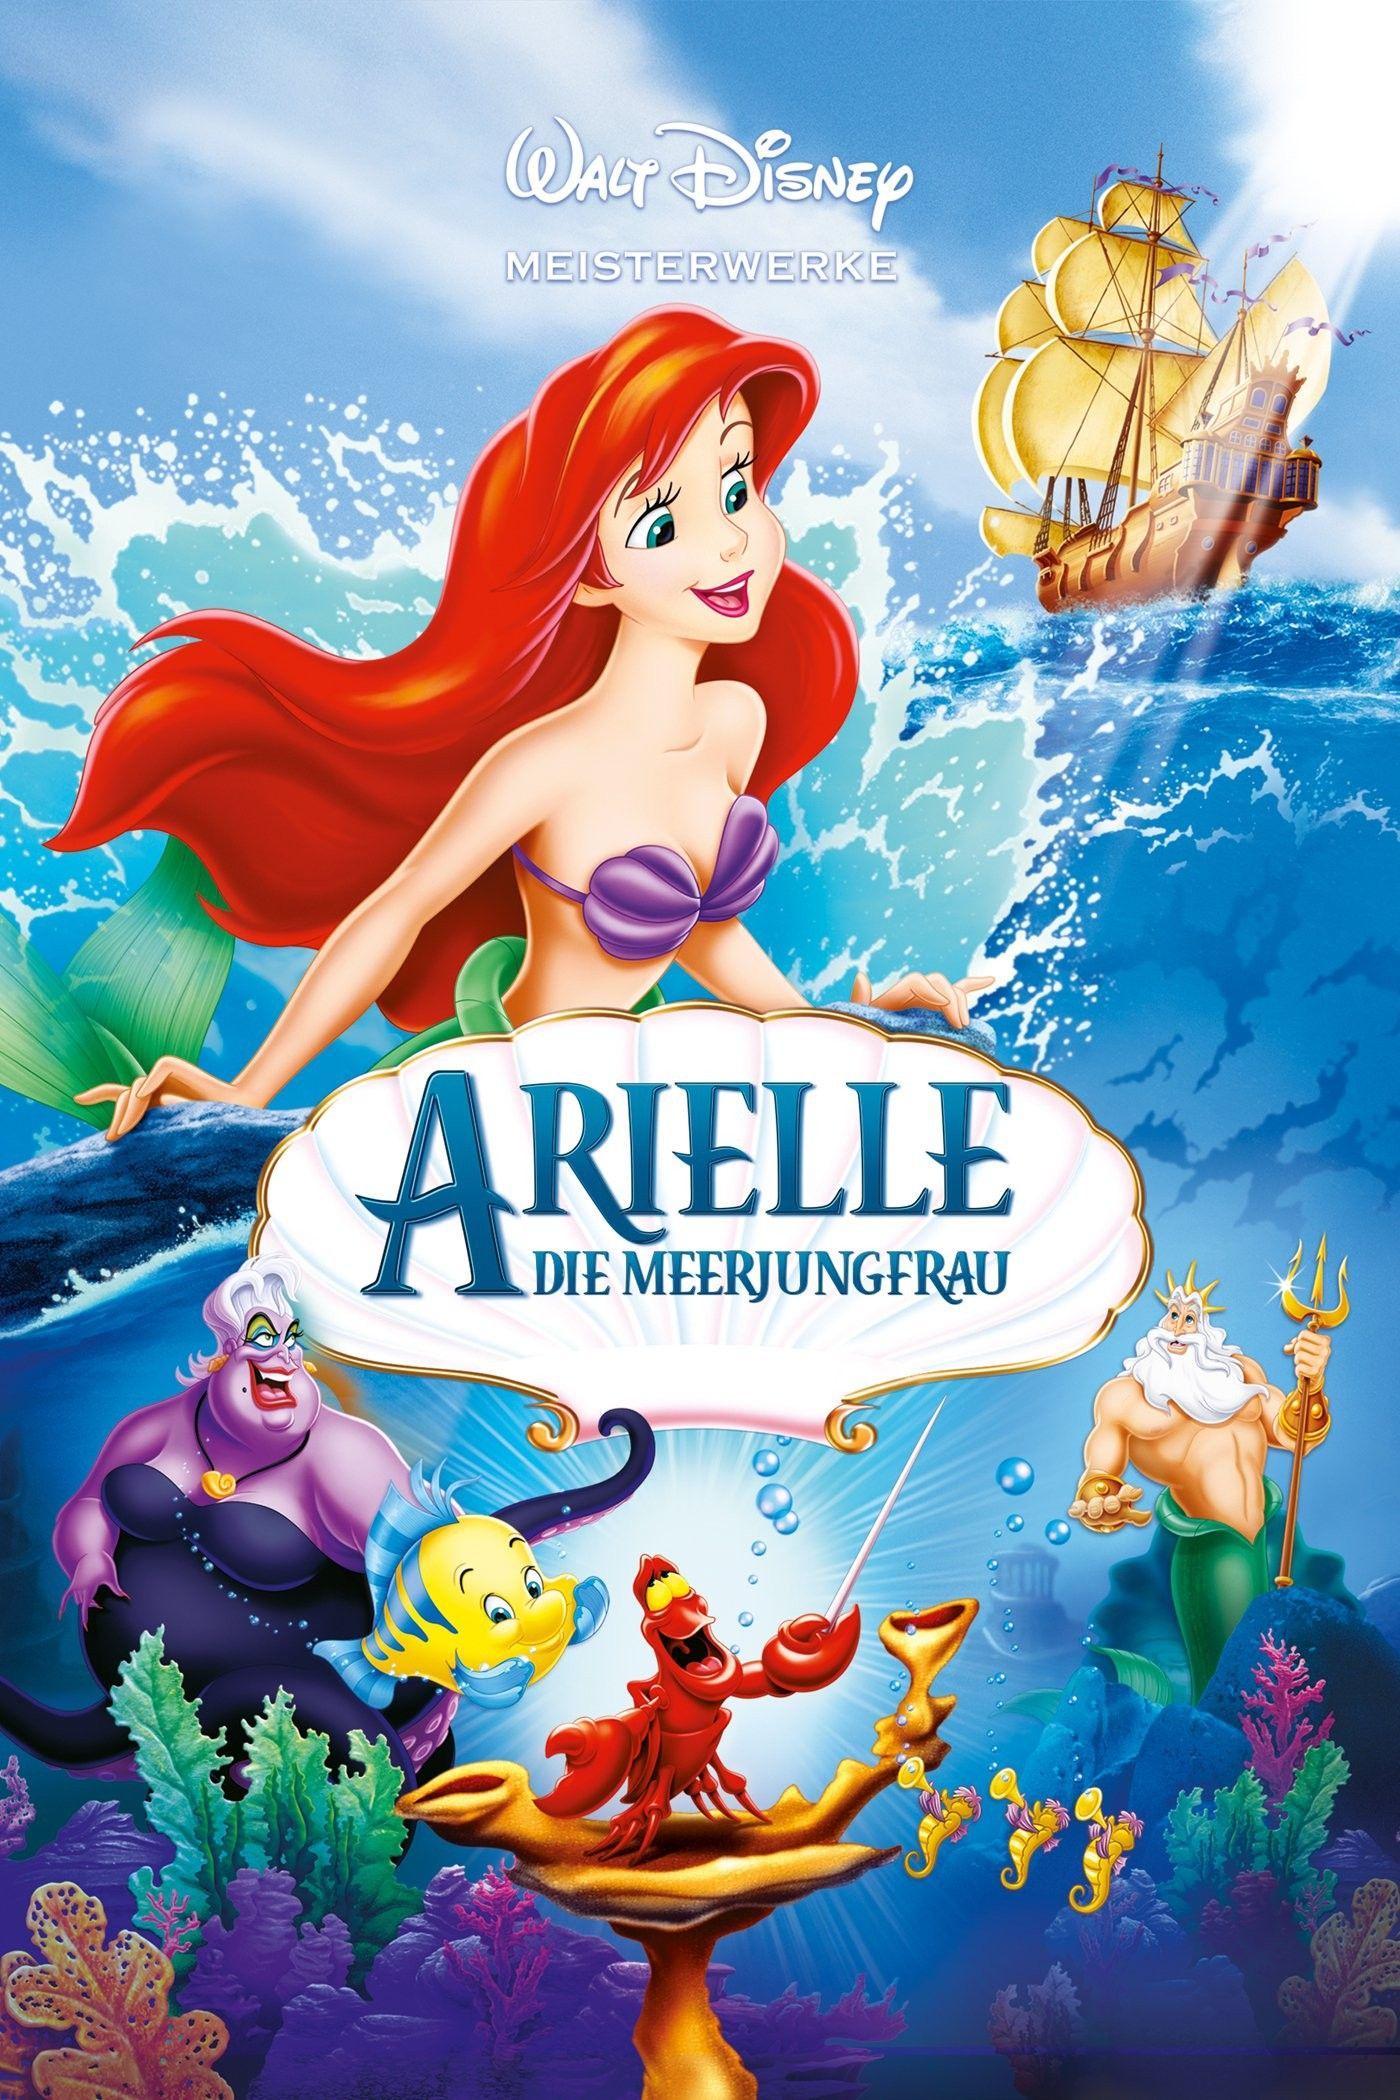 Arielle Die Meerjungfrau Kostenlos Online Anschauen 1989 Hd Full Film Deutsch Little Mermaid Movies Disney Movie Posters Little Mermaid Dvd